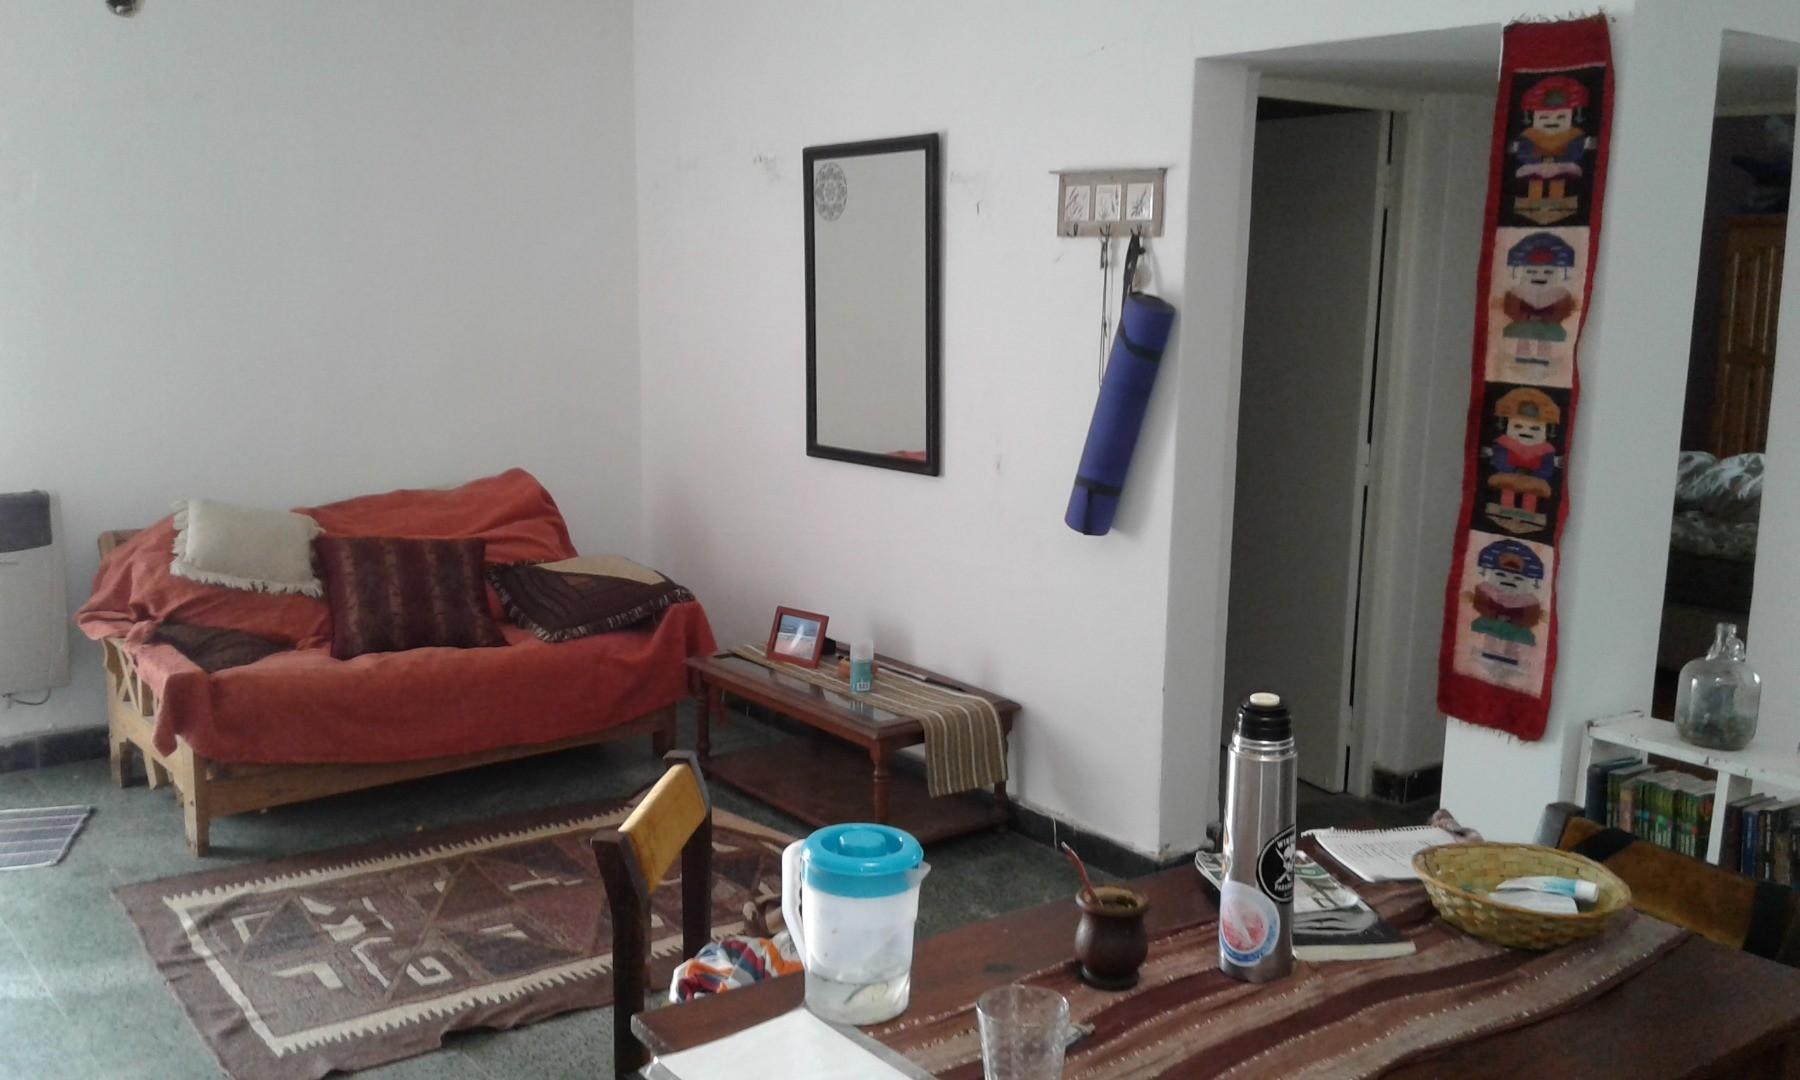 C & P Inmobiliaria: APTO CREDITO, Alberdi, interna única, no PH,  87 m2, 2 dormitorios, terraza